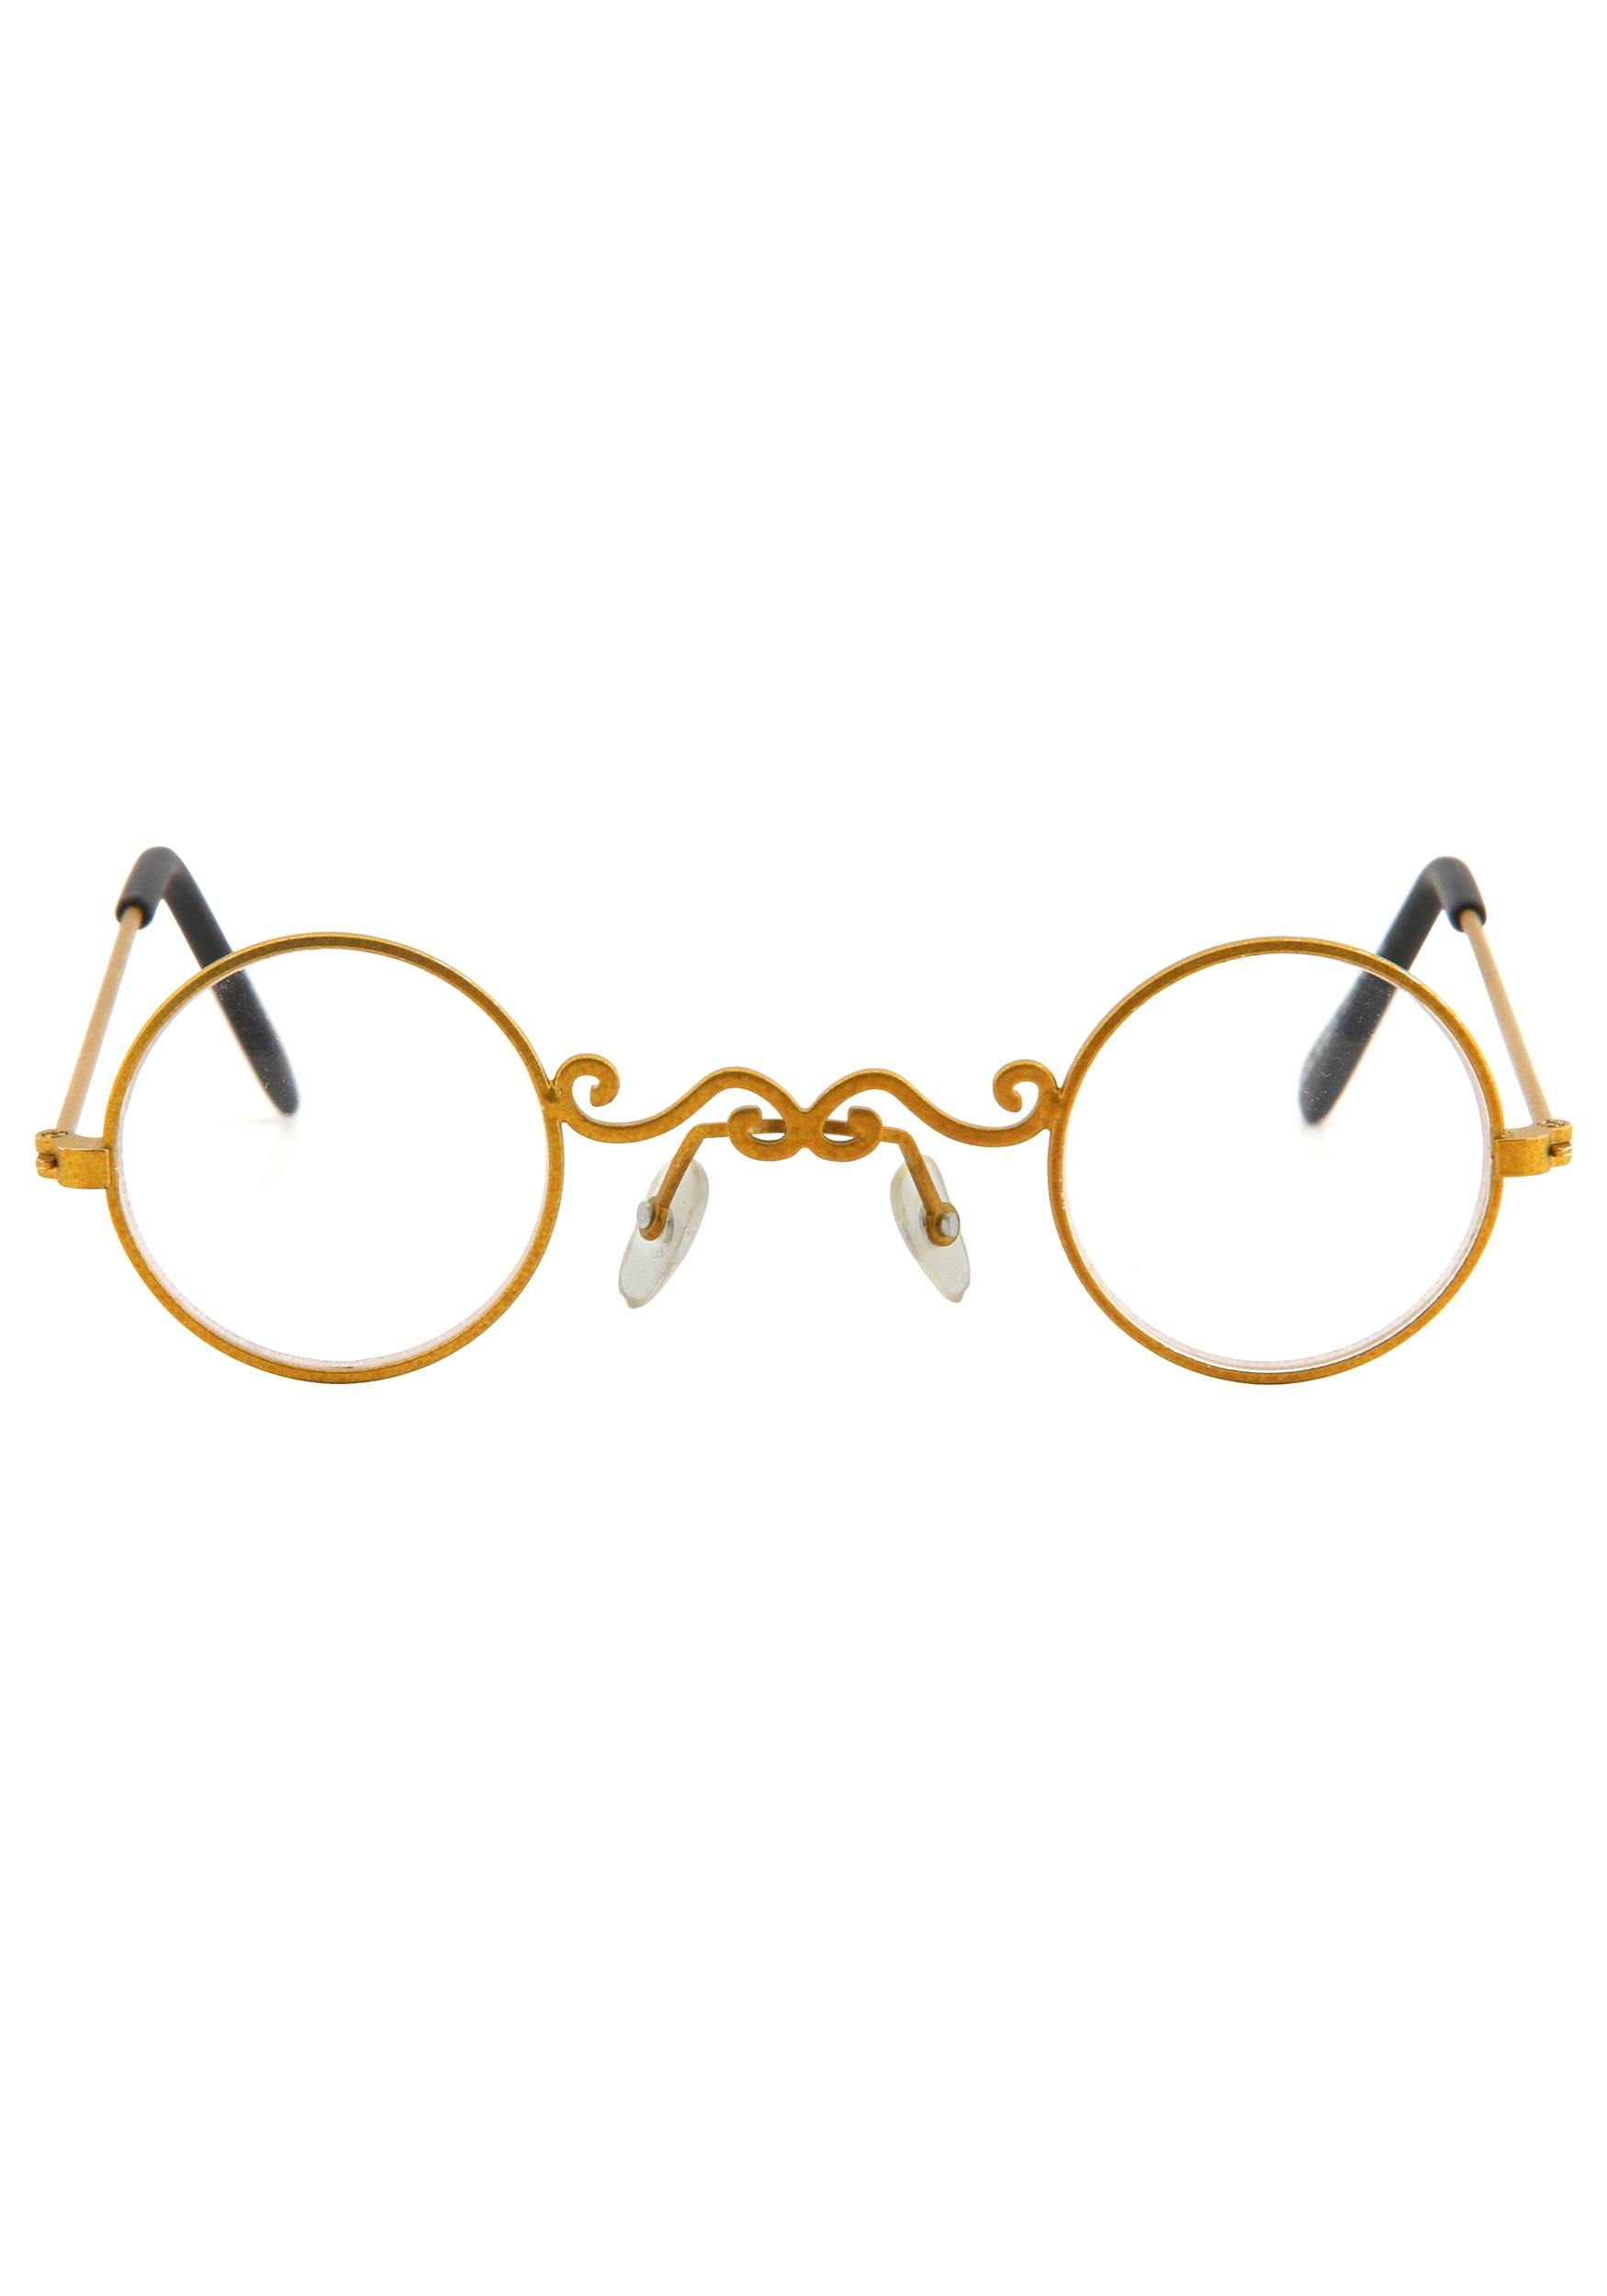 Pot Ou0027 Gold Glasses  sc 1 st  Halloween Costumes & Pot Ou0027 Gold Glasses - Halloween Costumes